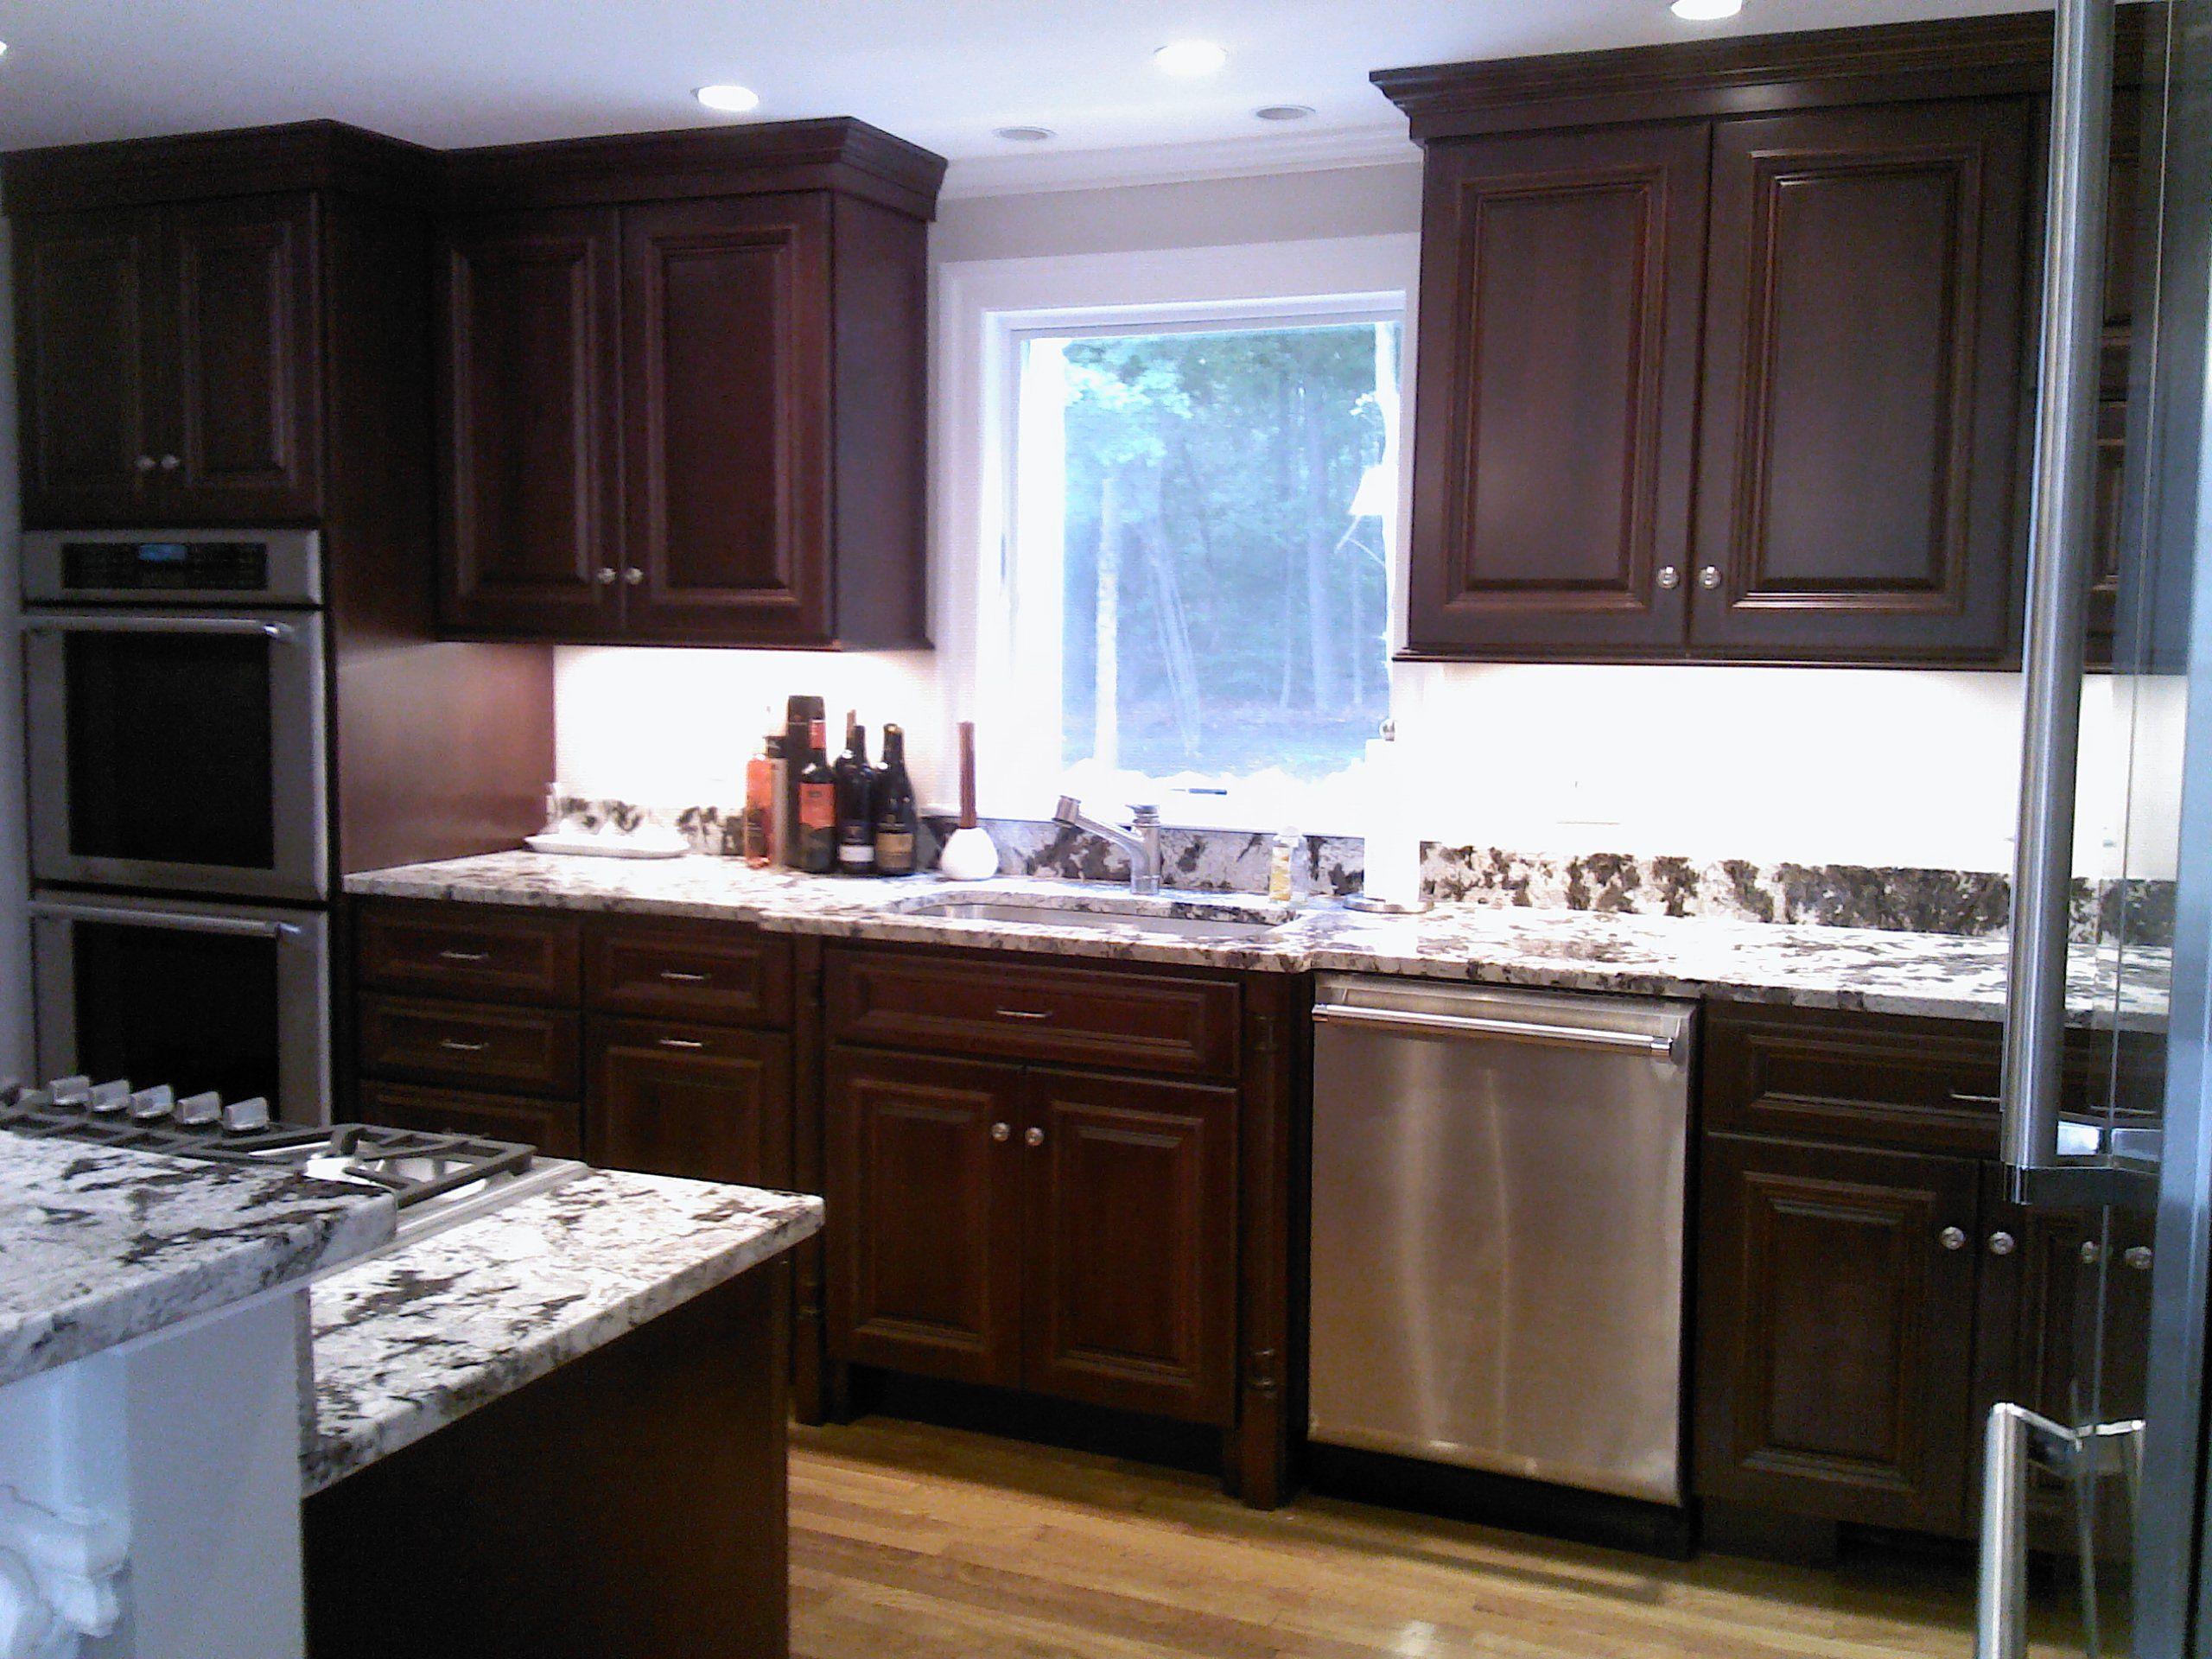 Kitchen Remodel Before After 7 Kitchen Remodel Kitchen